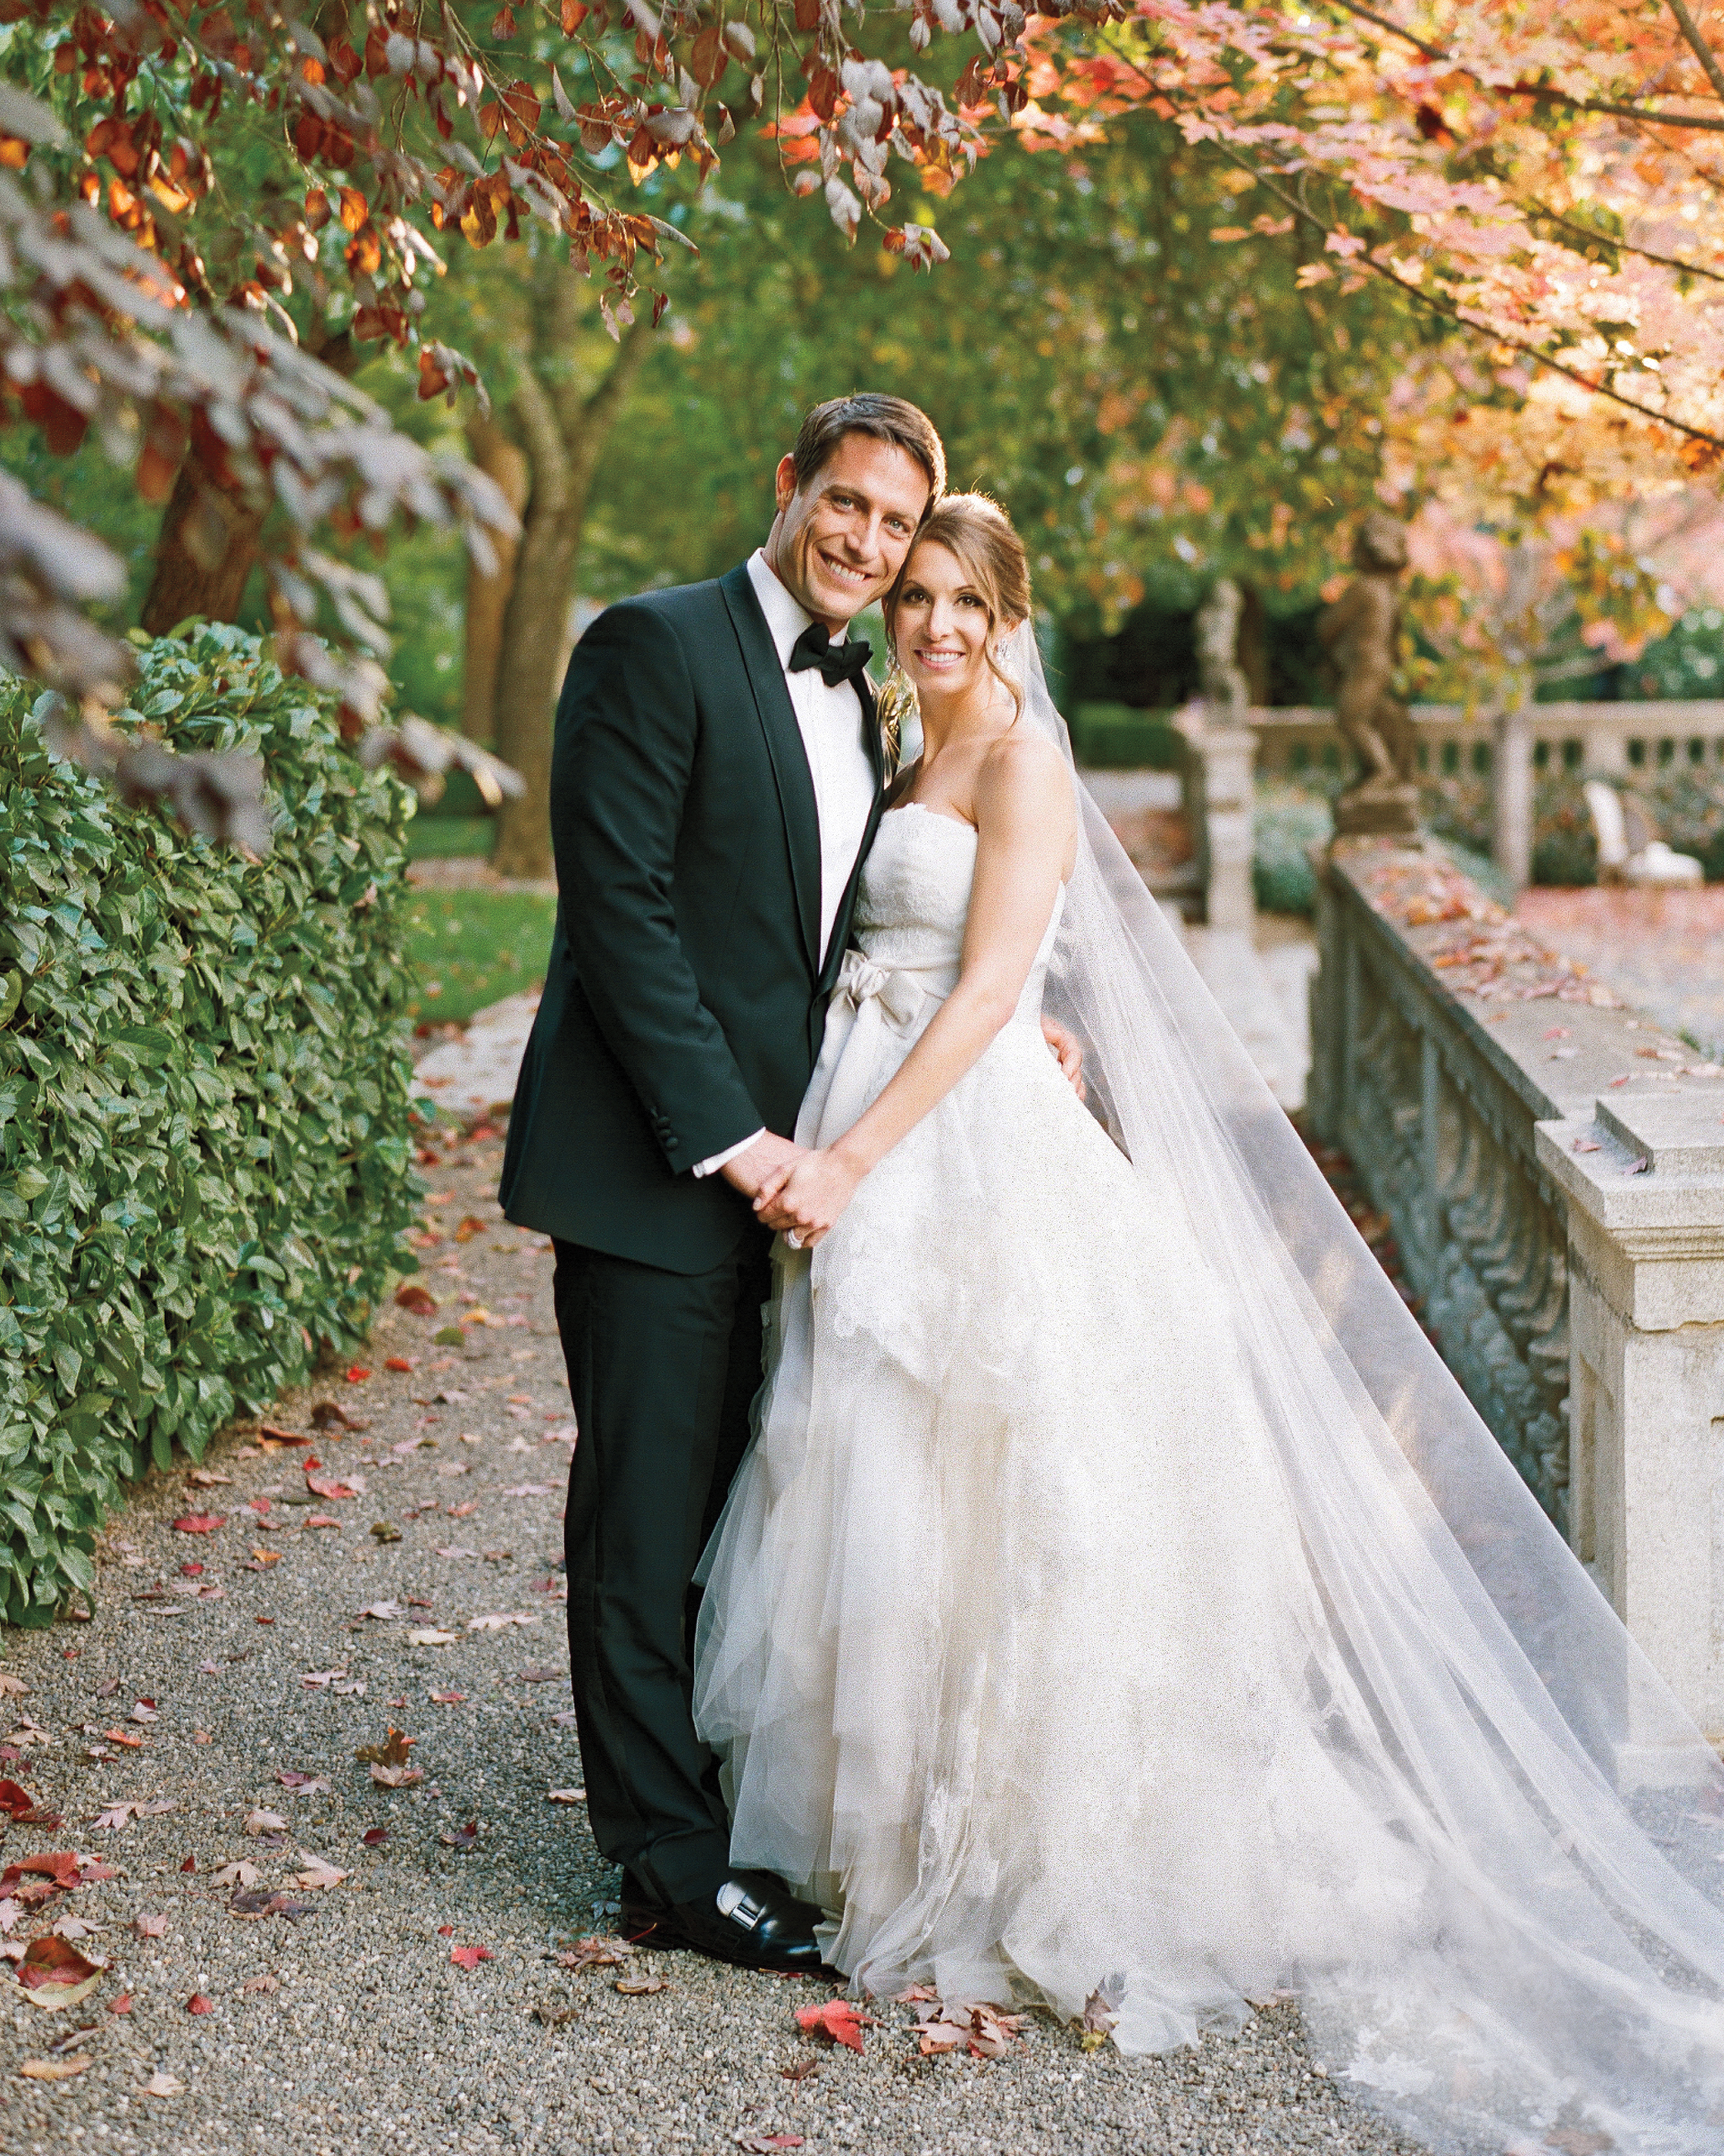 nicole-bradley-napa-california-wedding-1695-s112349.jpg